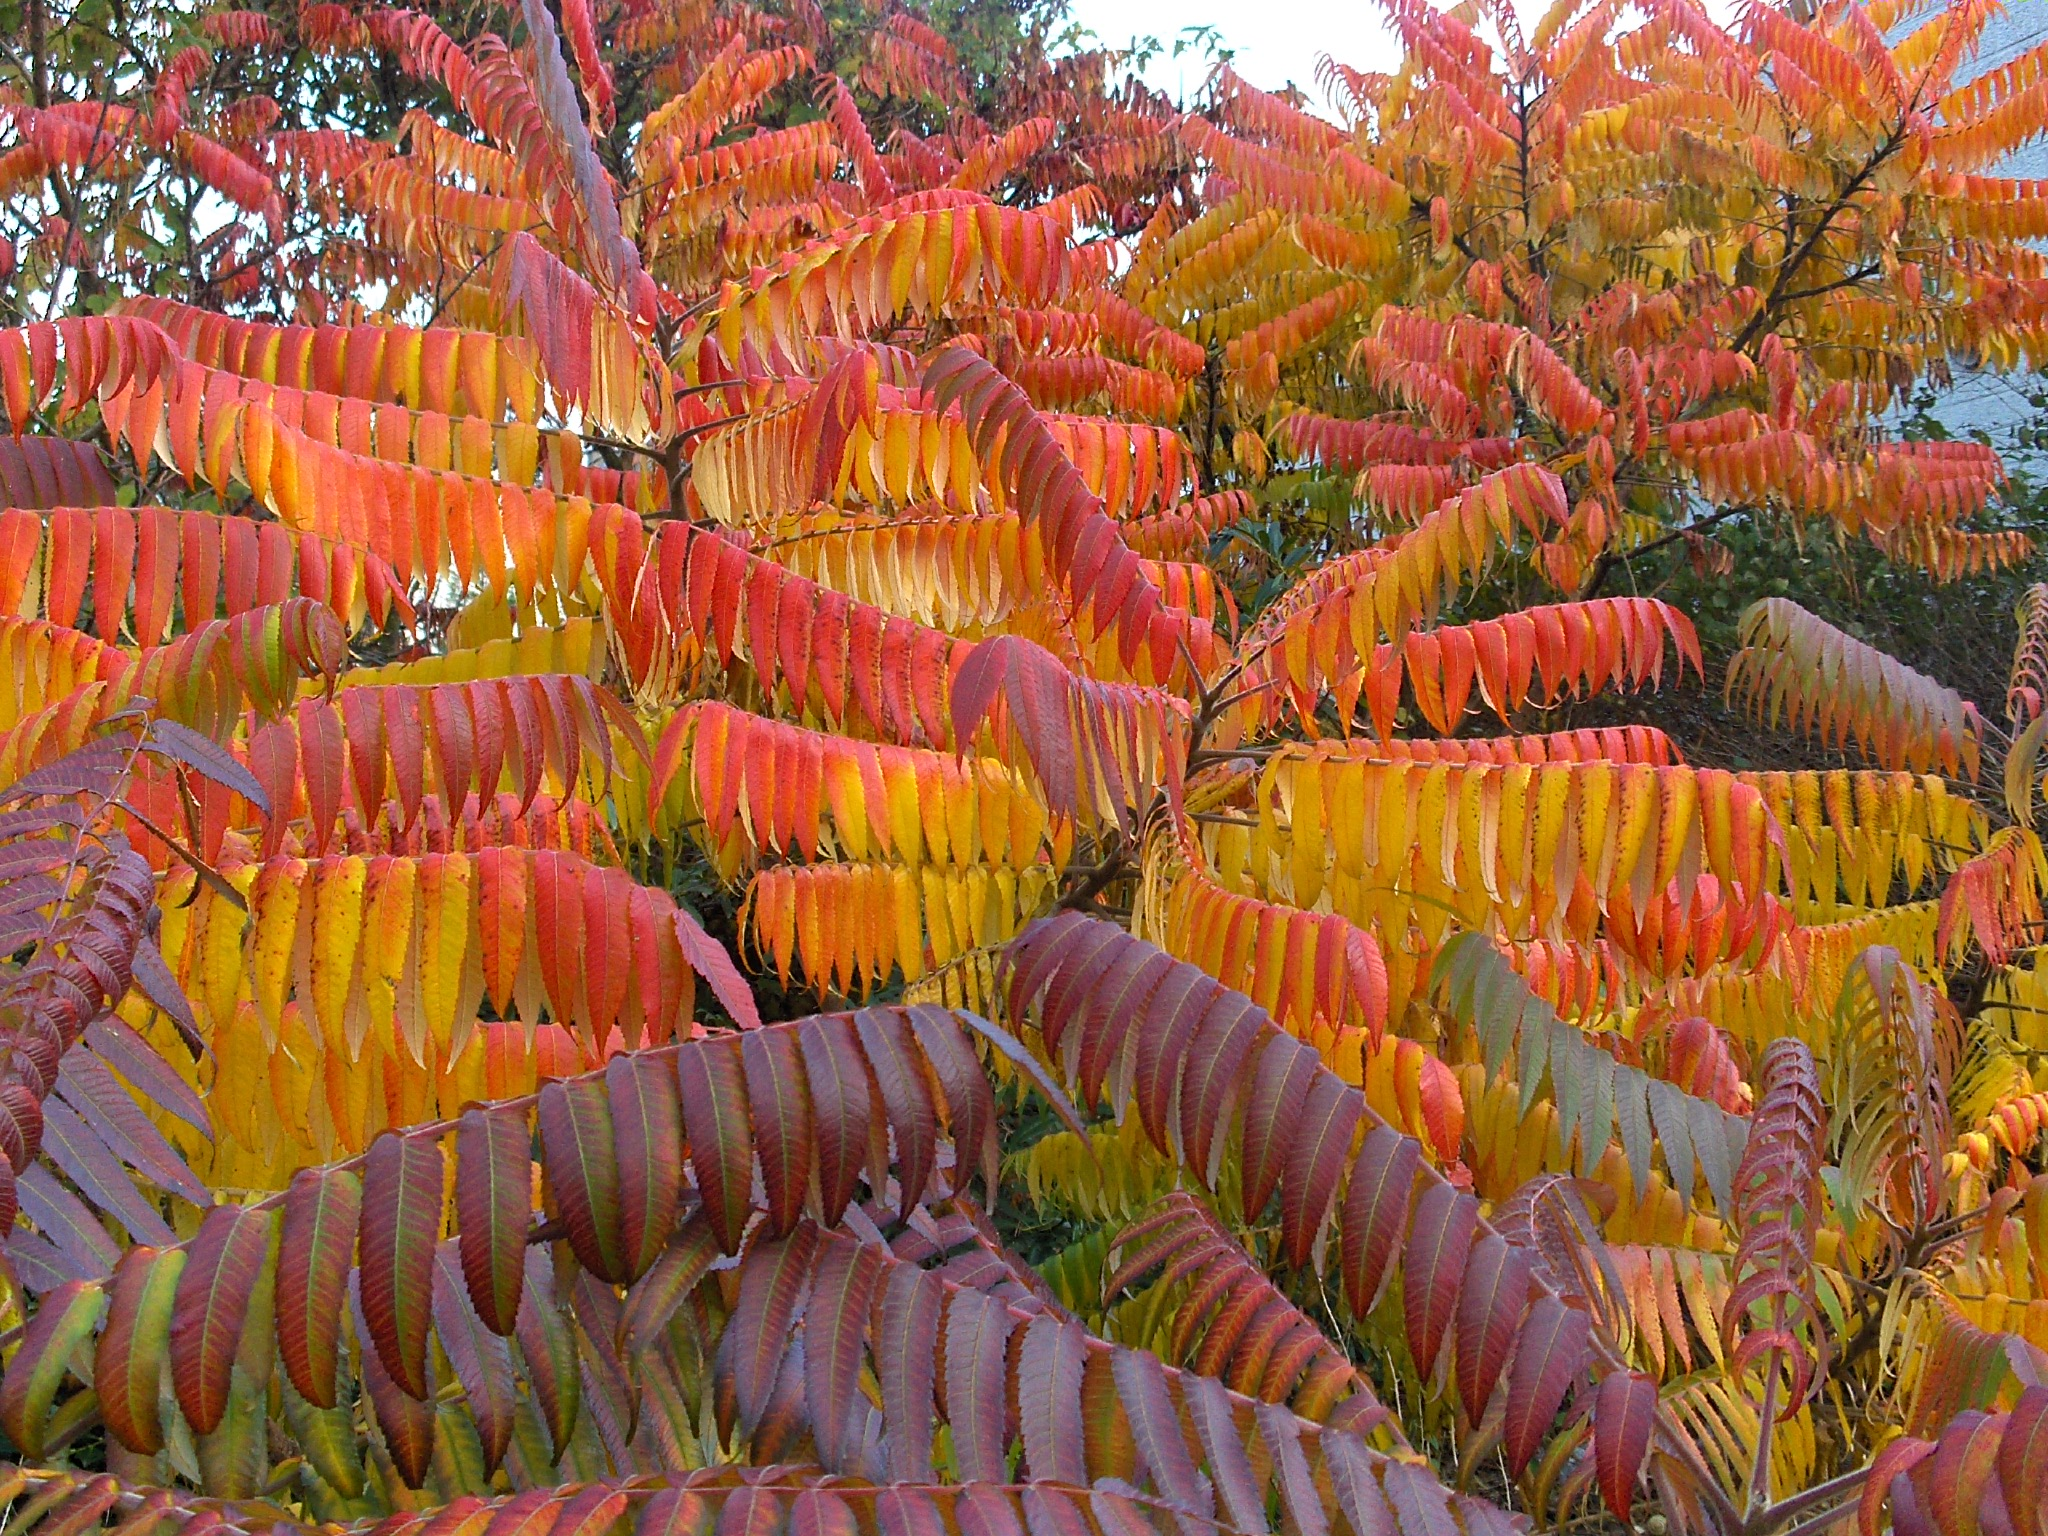 Belgium, Fall in Kraainem